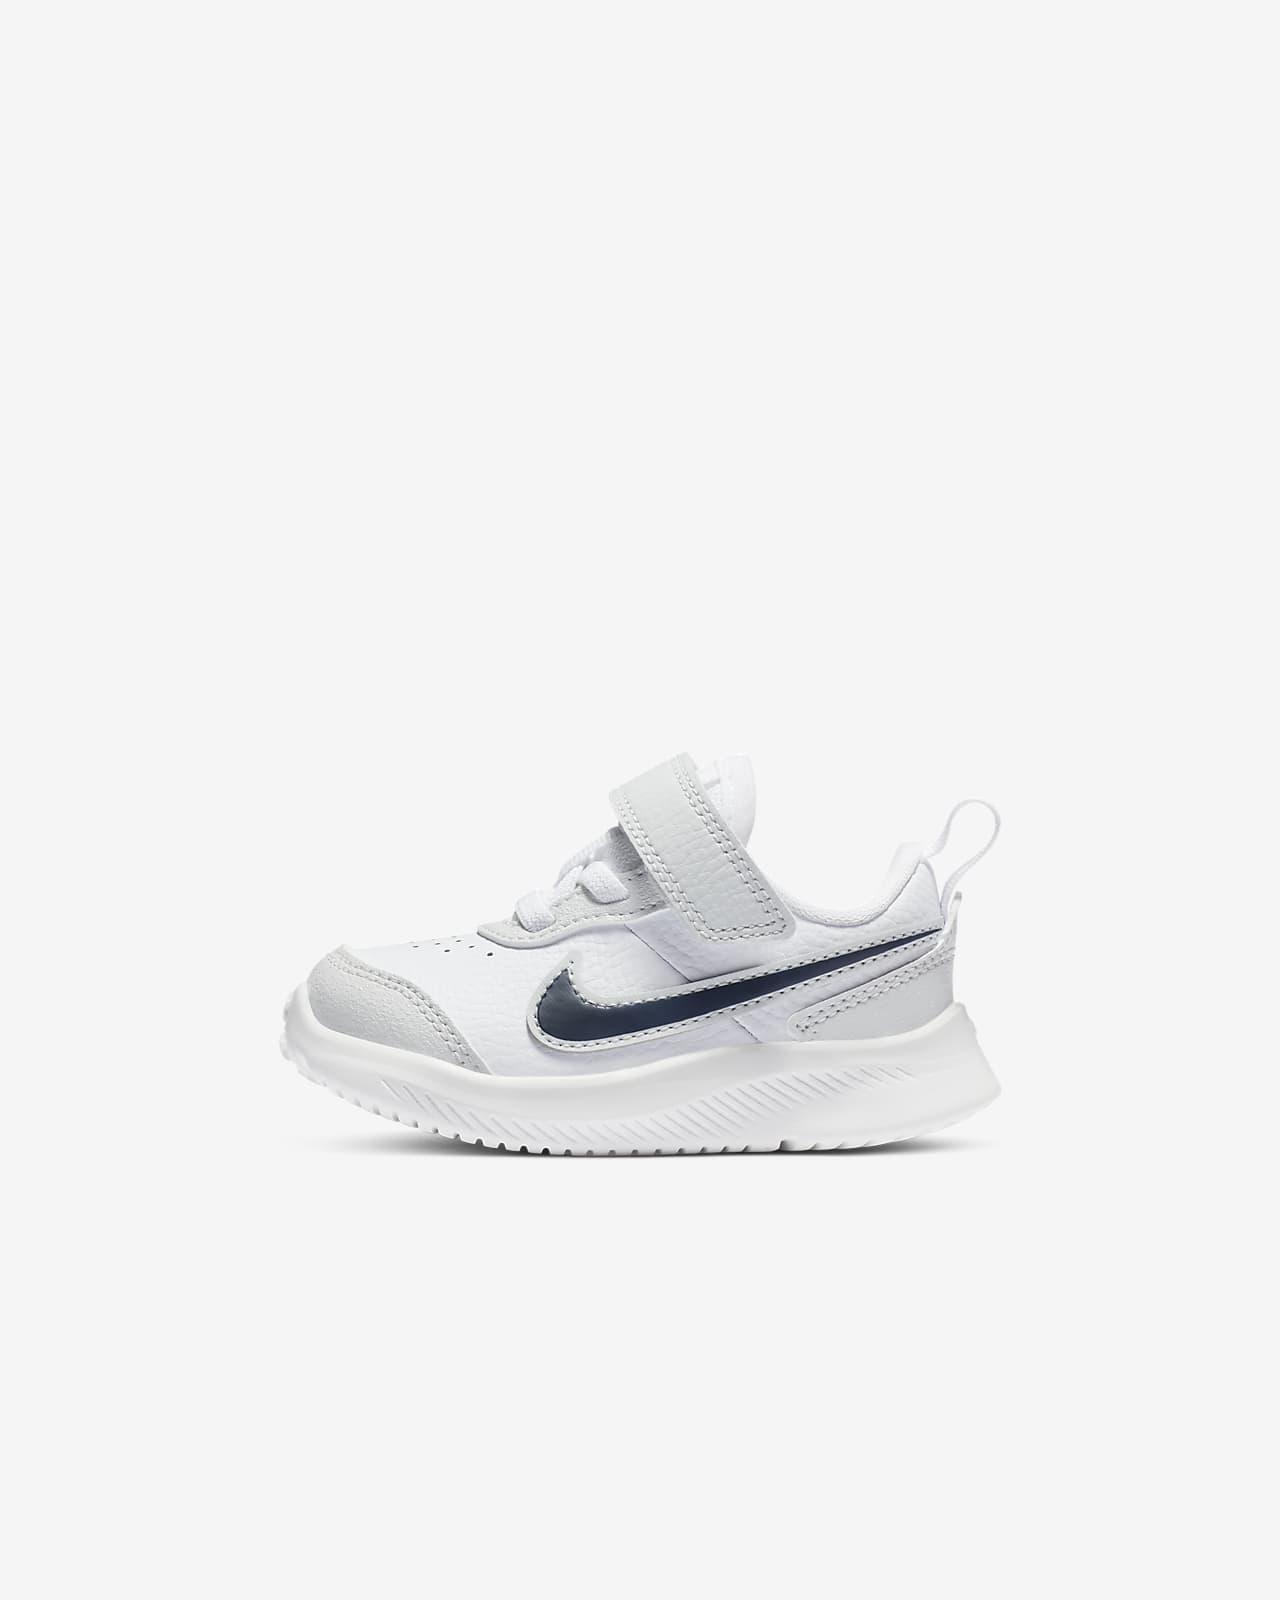 Nike Varsity Leather Baby and Toddler Shoe